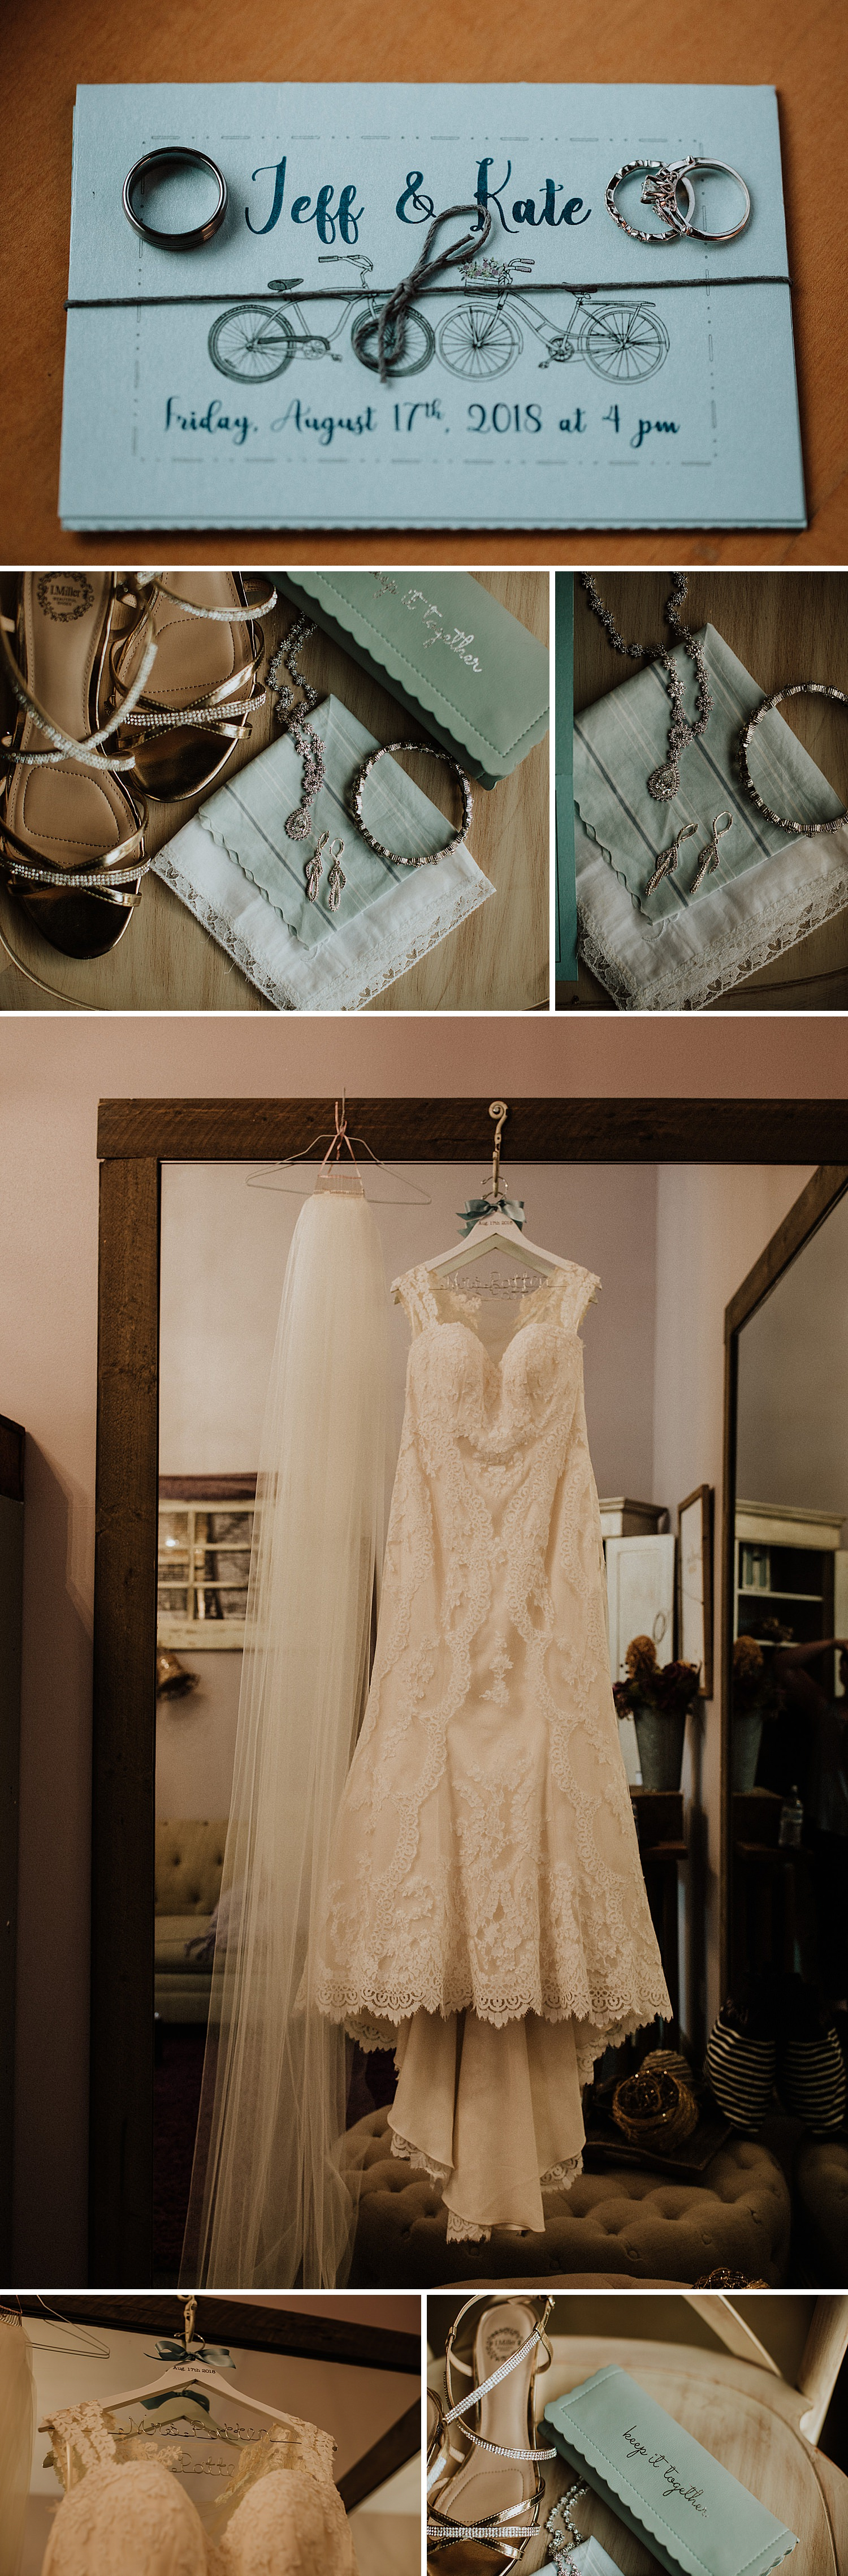 Terrace-167-Documentary-Wedding-Photographer_0001.jpg